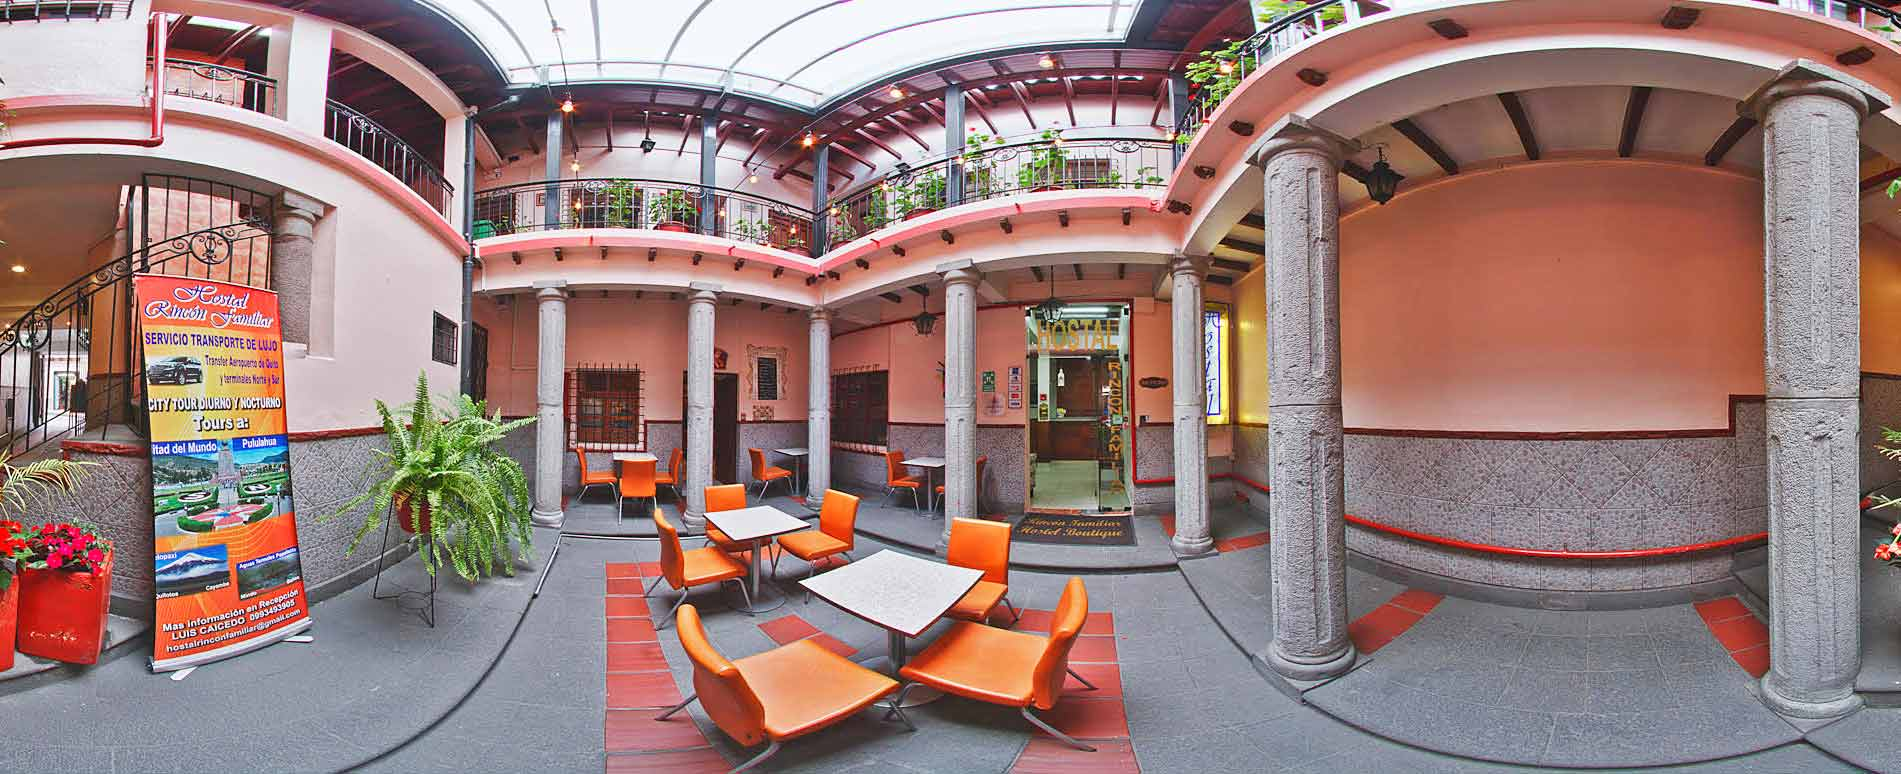 Hostel Boutique in Quito